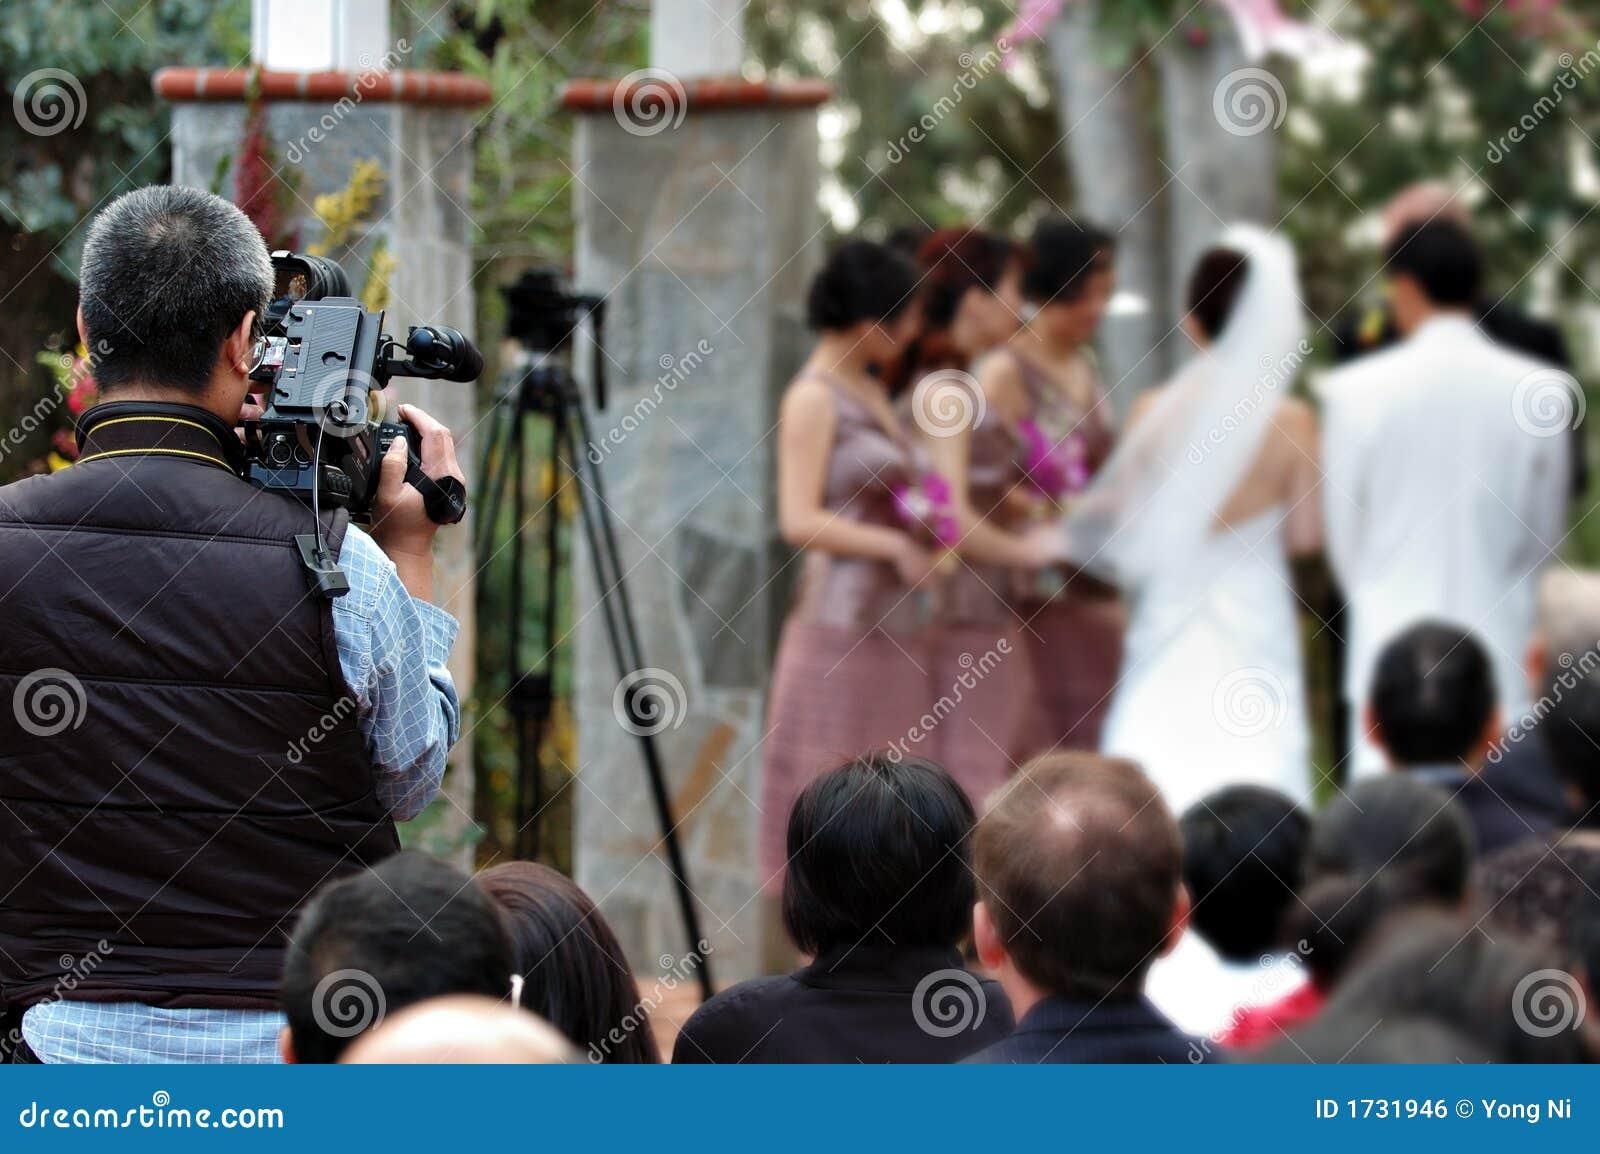 Wedding Videographer Royalty Free Stock Image Image 1731946